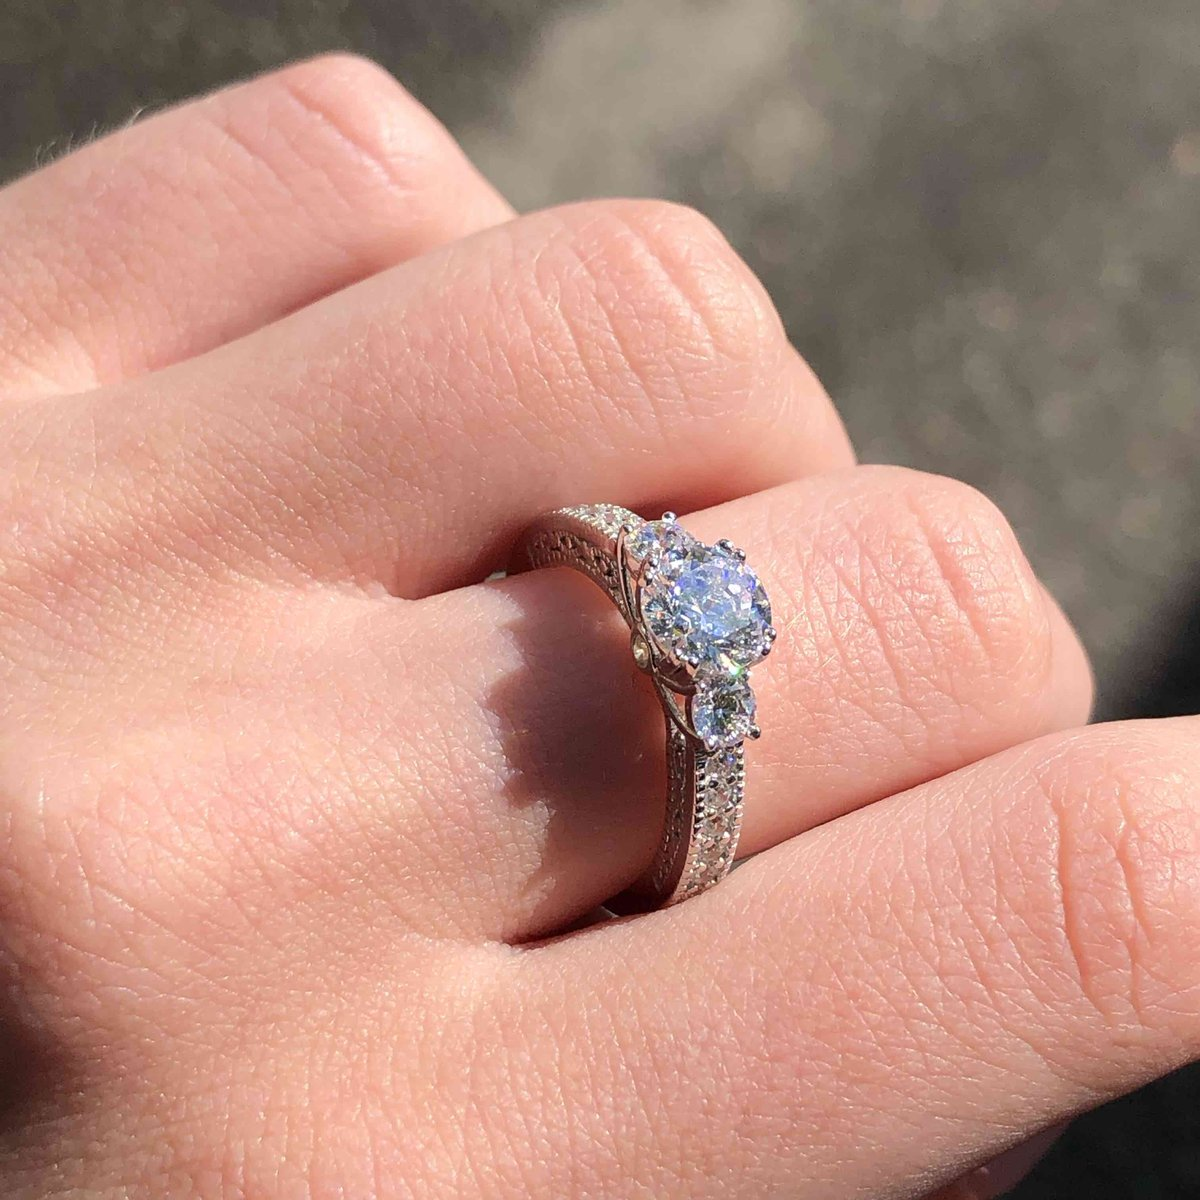 Цена смешная за такое красивое кольцо